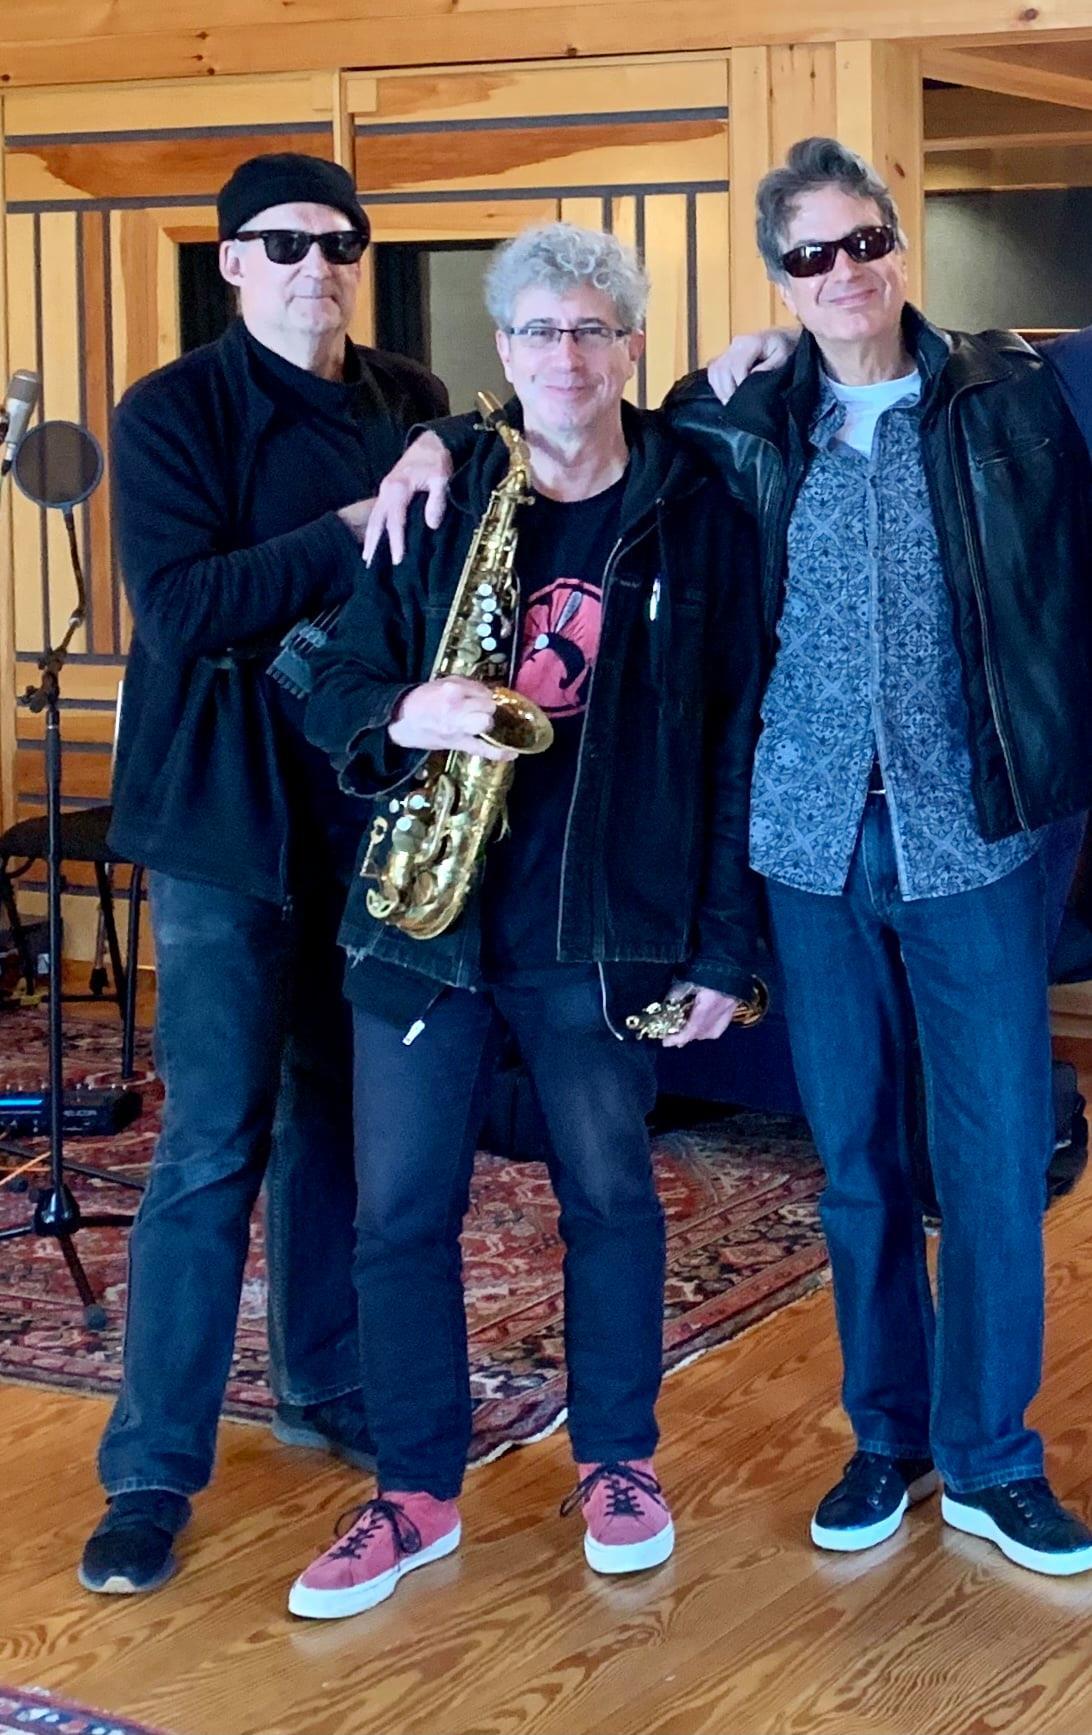 B.Mez with Michael Bierylo, Ken Field and Rick Scott